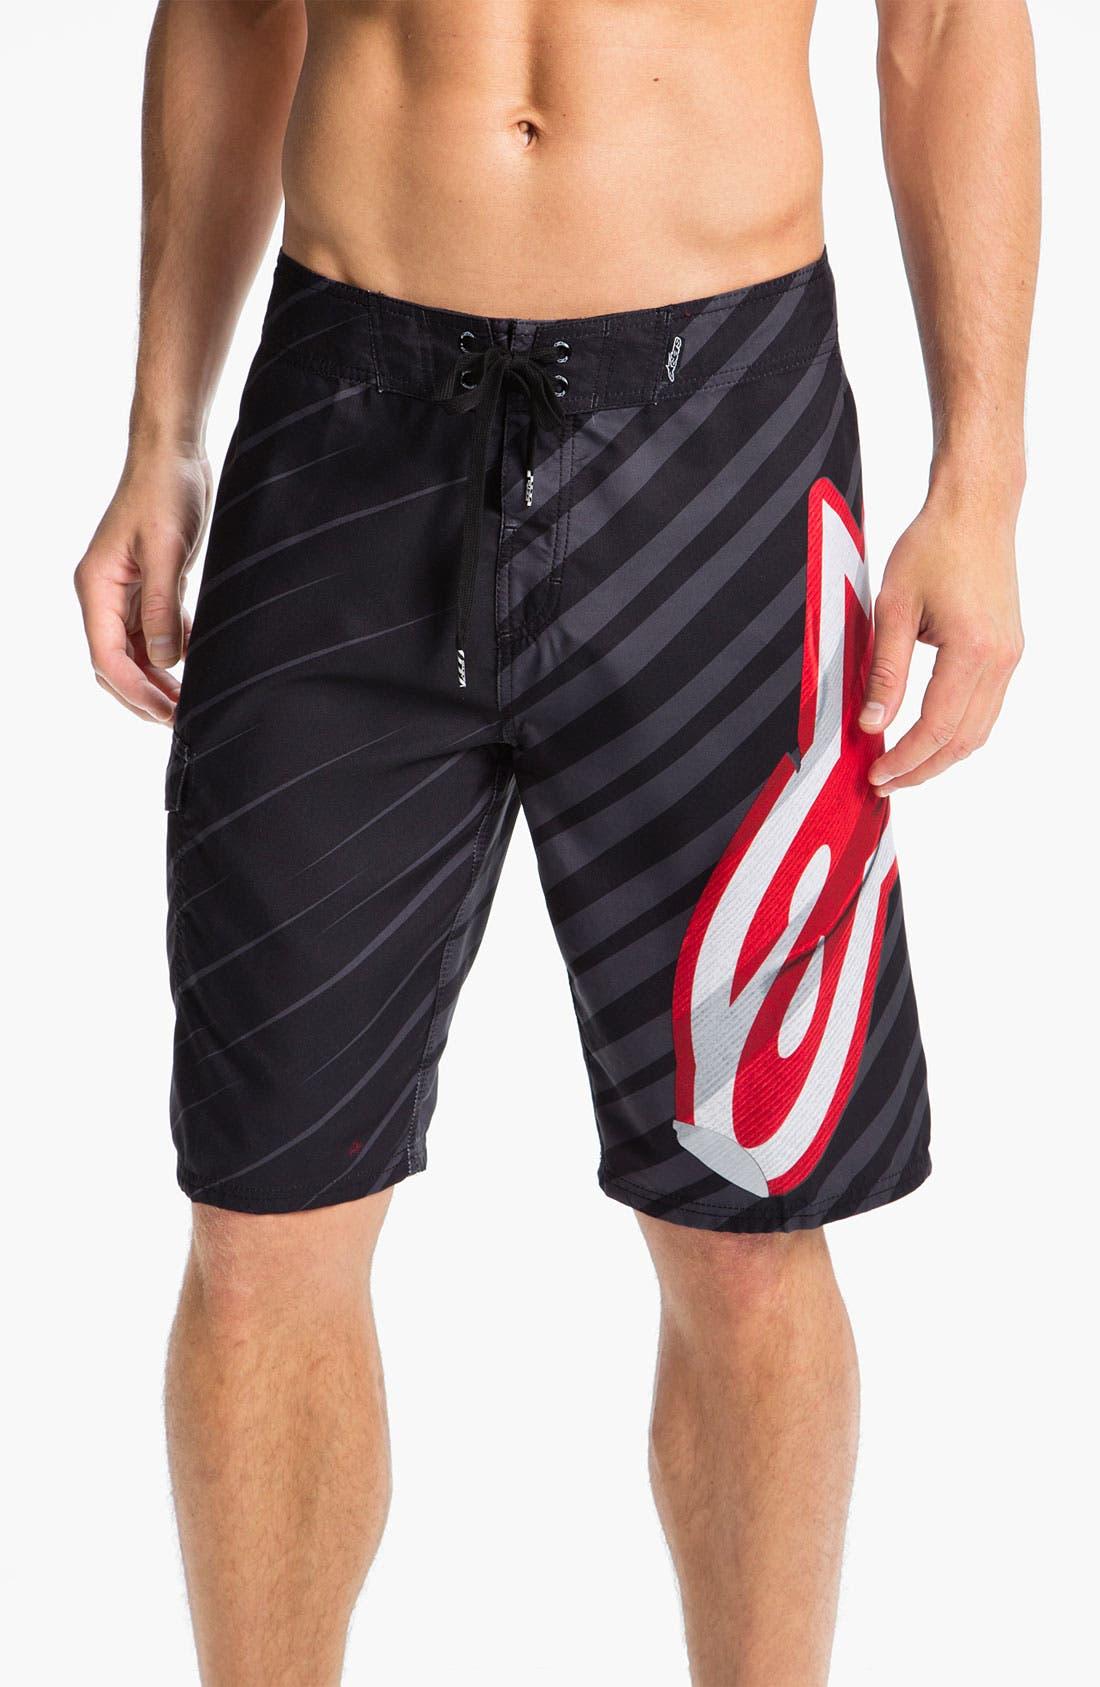 Alternate Image 1 Selected - Alpinestars 'Stick It' Board Shorts